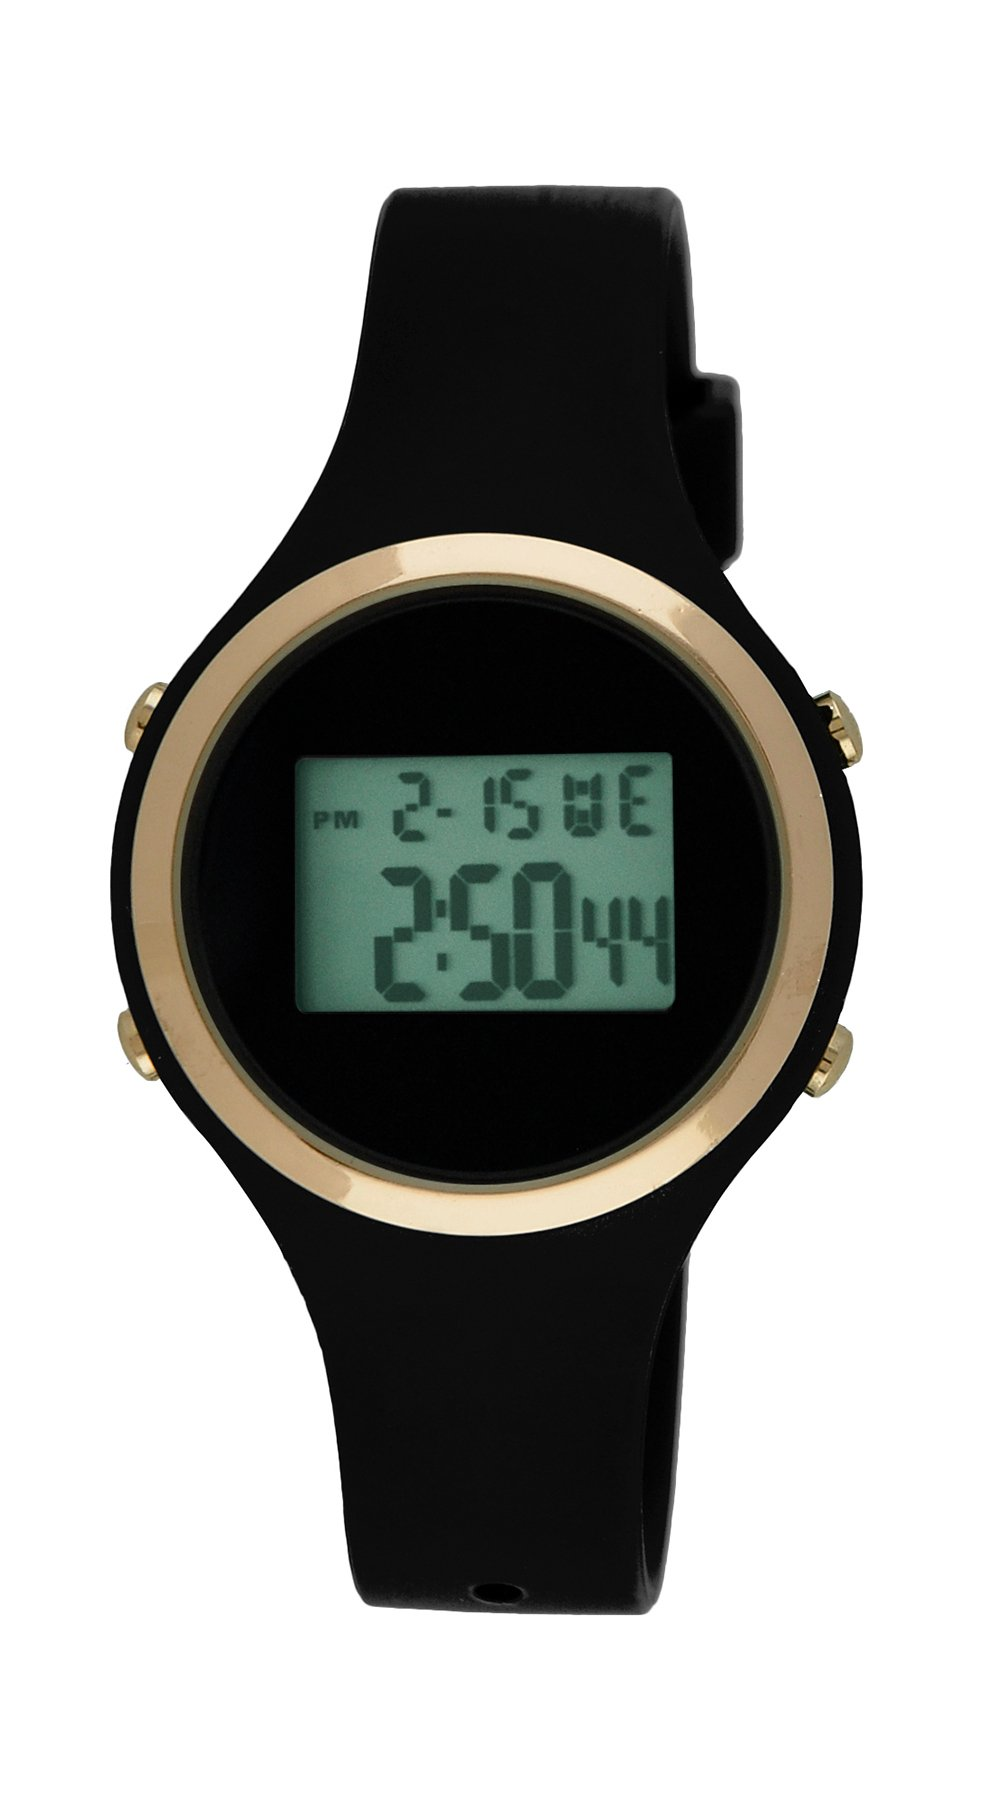 Discreet Luxury Women Bracelet Watches Stainless Steel Mesh Band Sports Business Quartz Wrist Watch Casual Ladies Girls Dress Clock Usps Yet Not Vulgar Men's Watches Watches